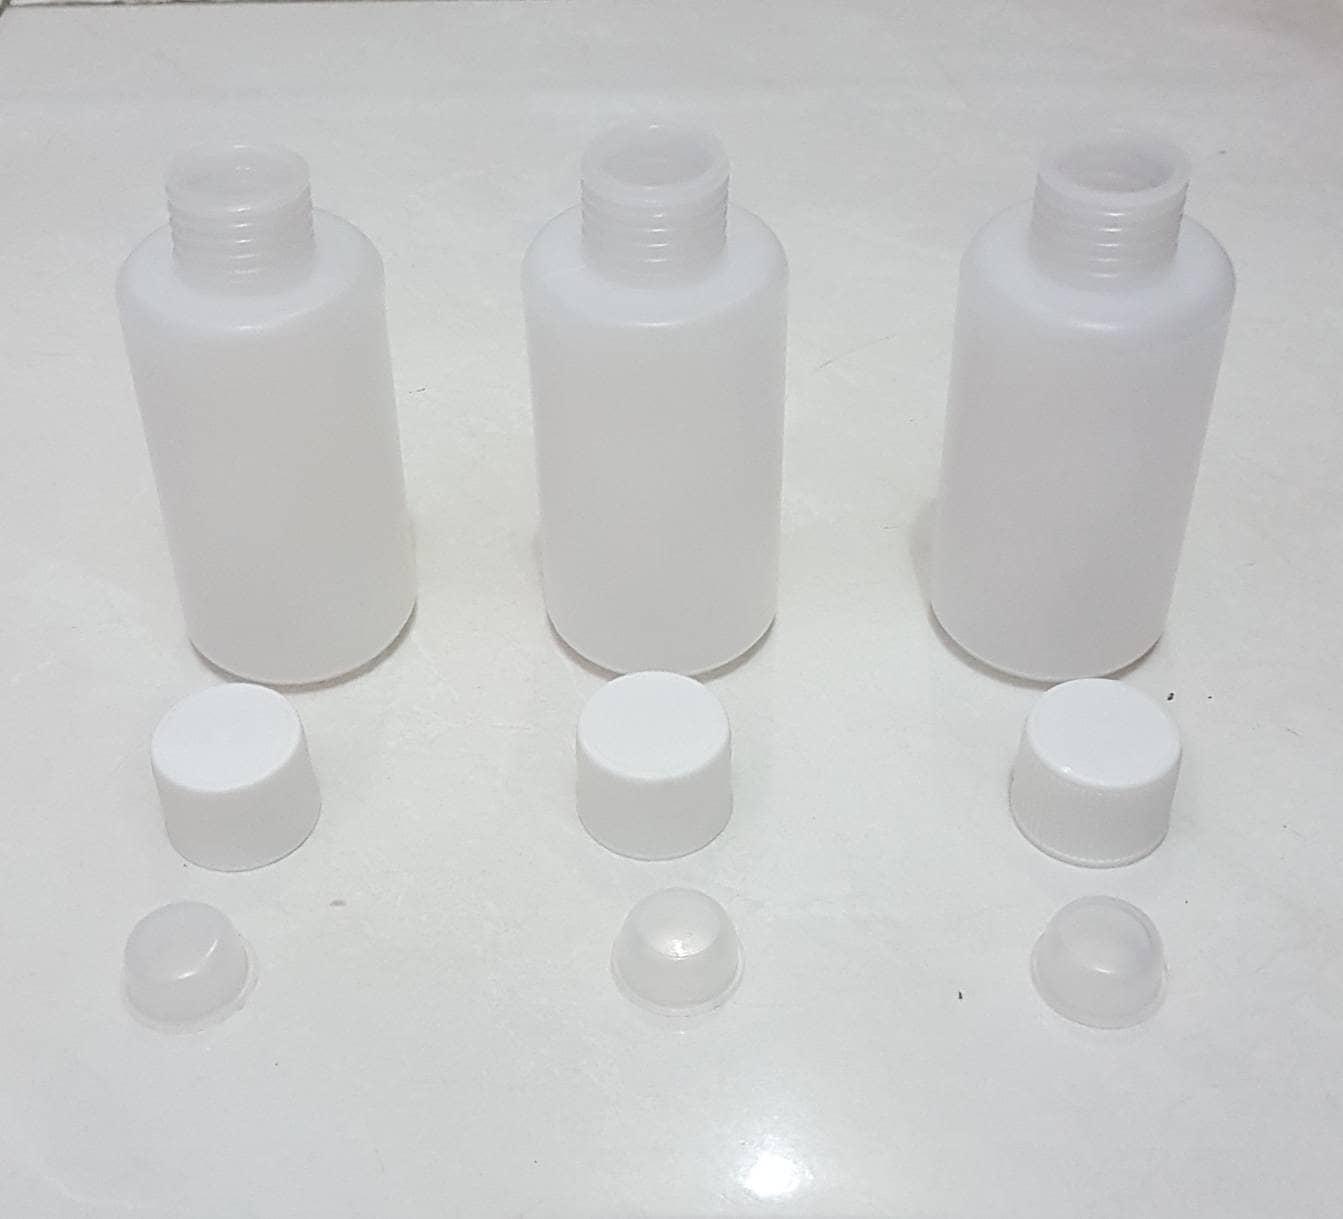 Jual Botol Plastik 100ml Hdpe Puith Double Tutup Ulir Lebih Aman Topi Highlight